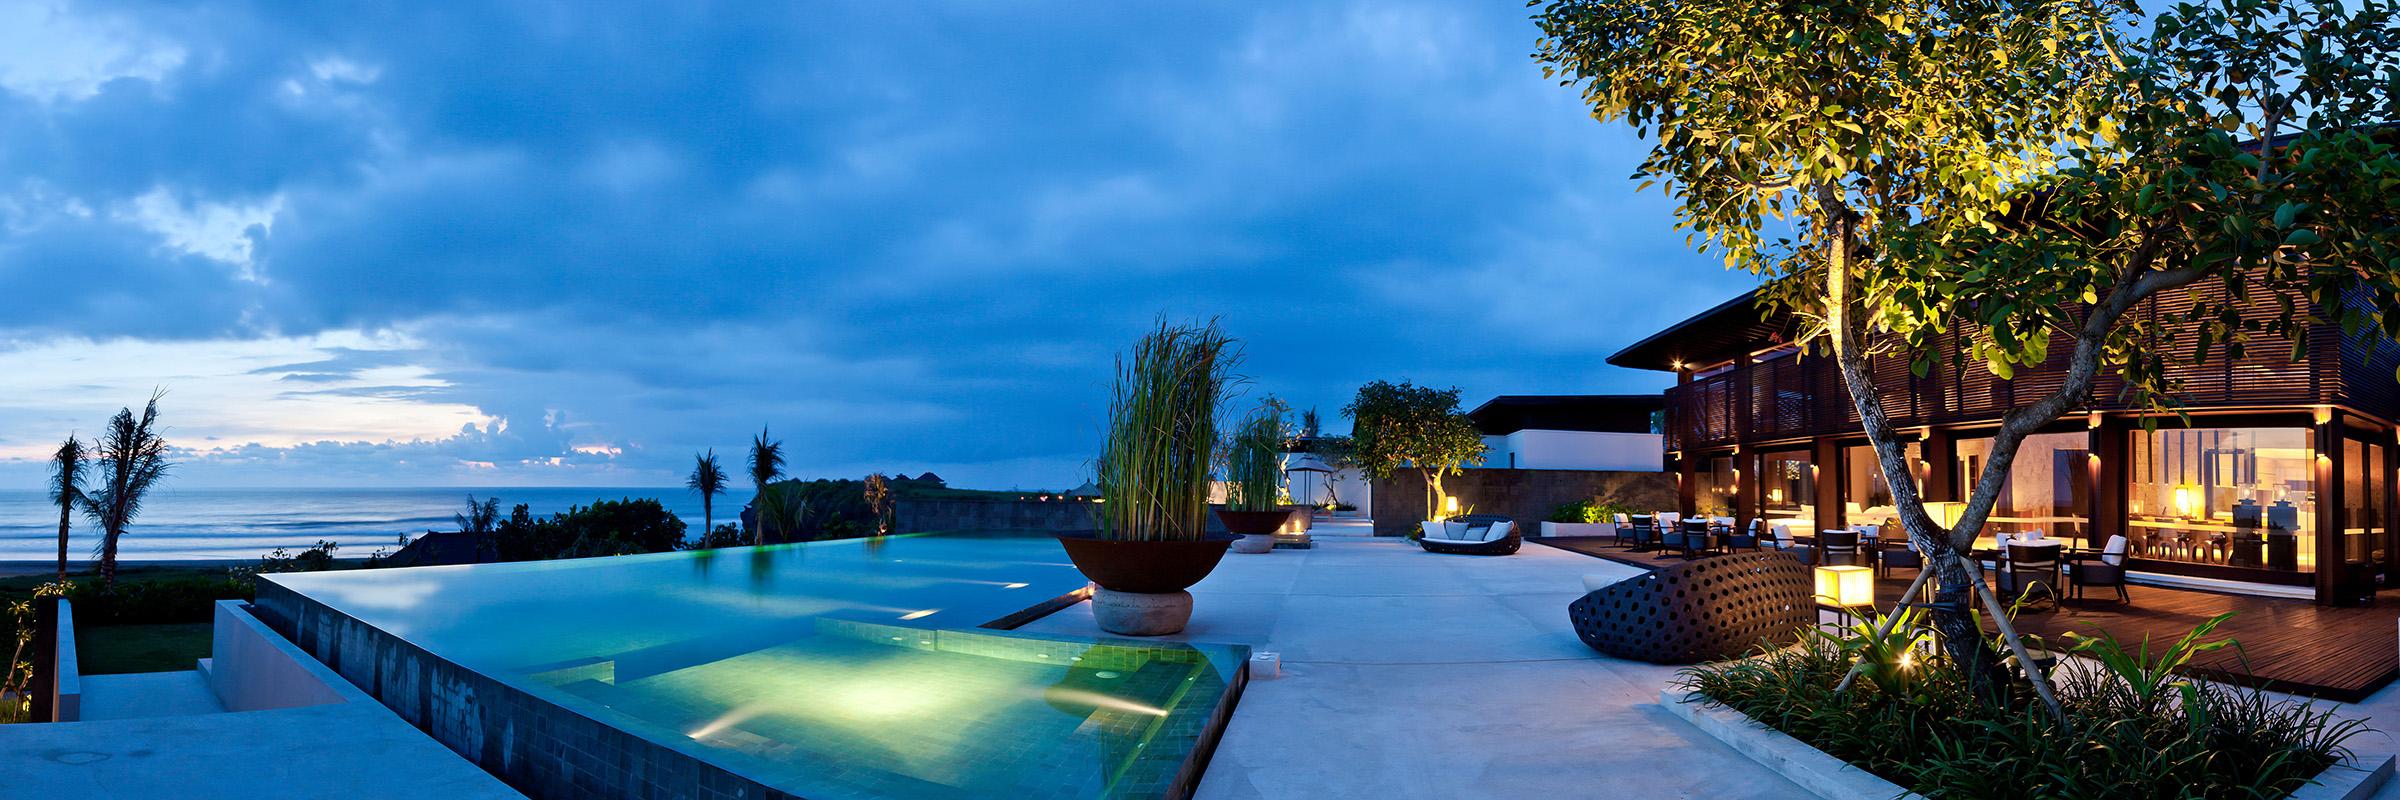 adelaparvu.com despre Alila Villas Soori Foto Design Hotels (13)